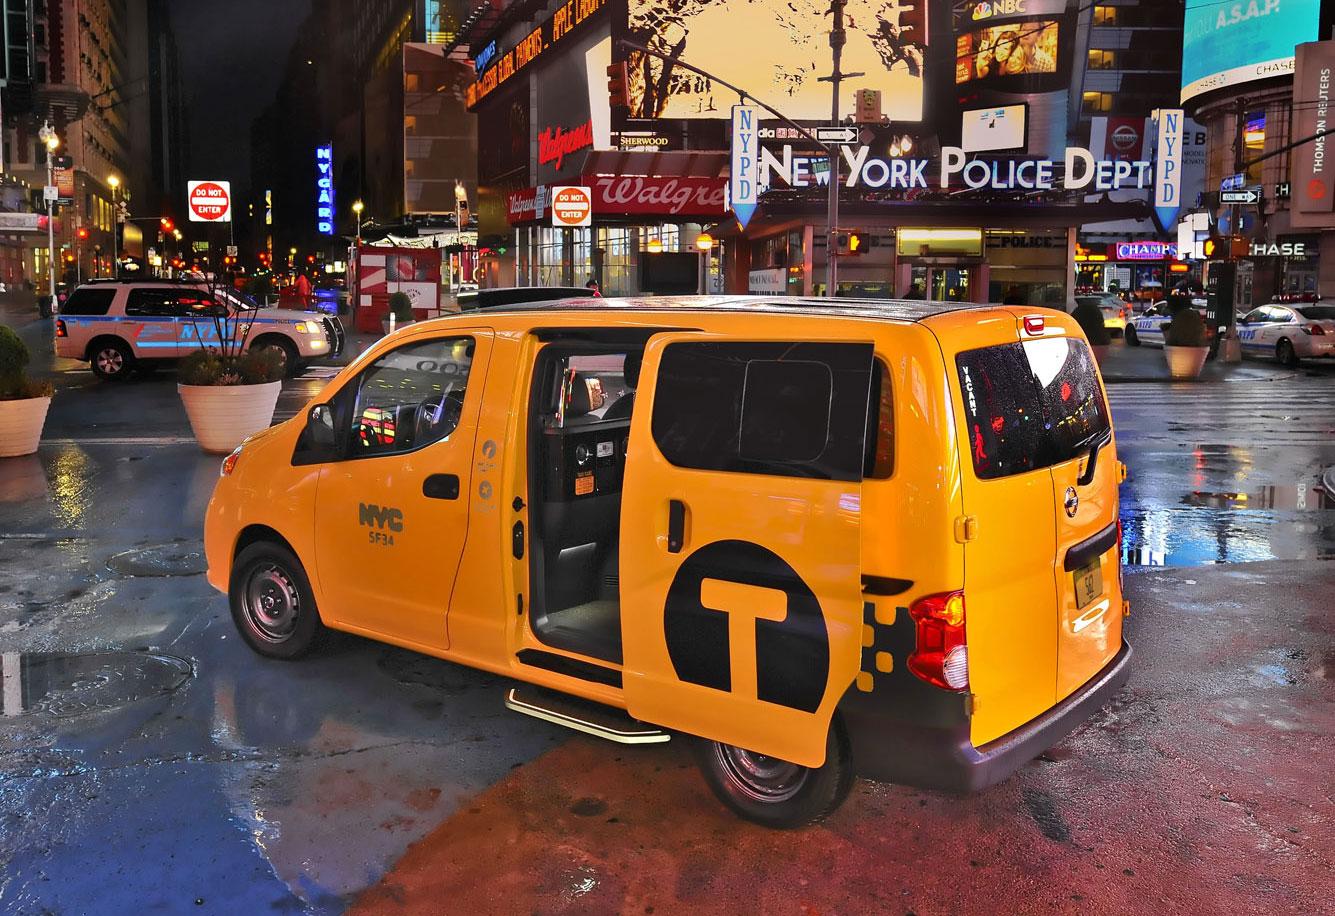 http://2.bp.blogspot.com/-o5mCEbVe9zg/T_99pl6FZfI/AAAAAAAAE2o/1sWk-0p3fuc/s1600/Nissan+NV200+New+York+Taxi+Hd+Wallpapers+2014.5.jpg